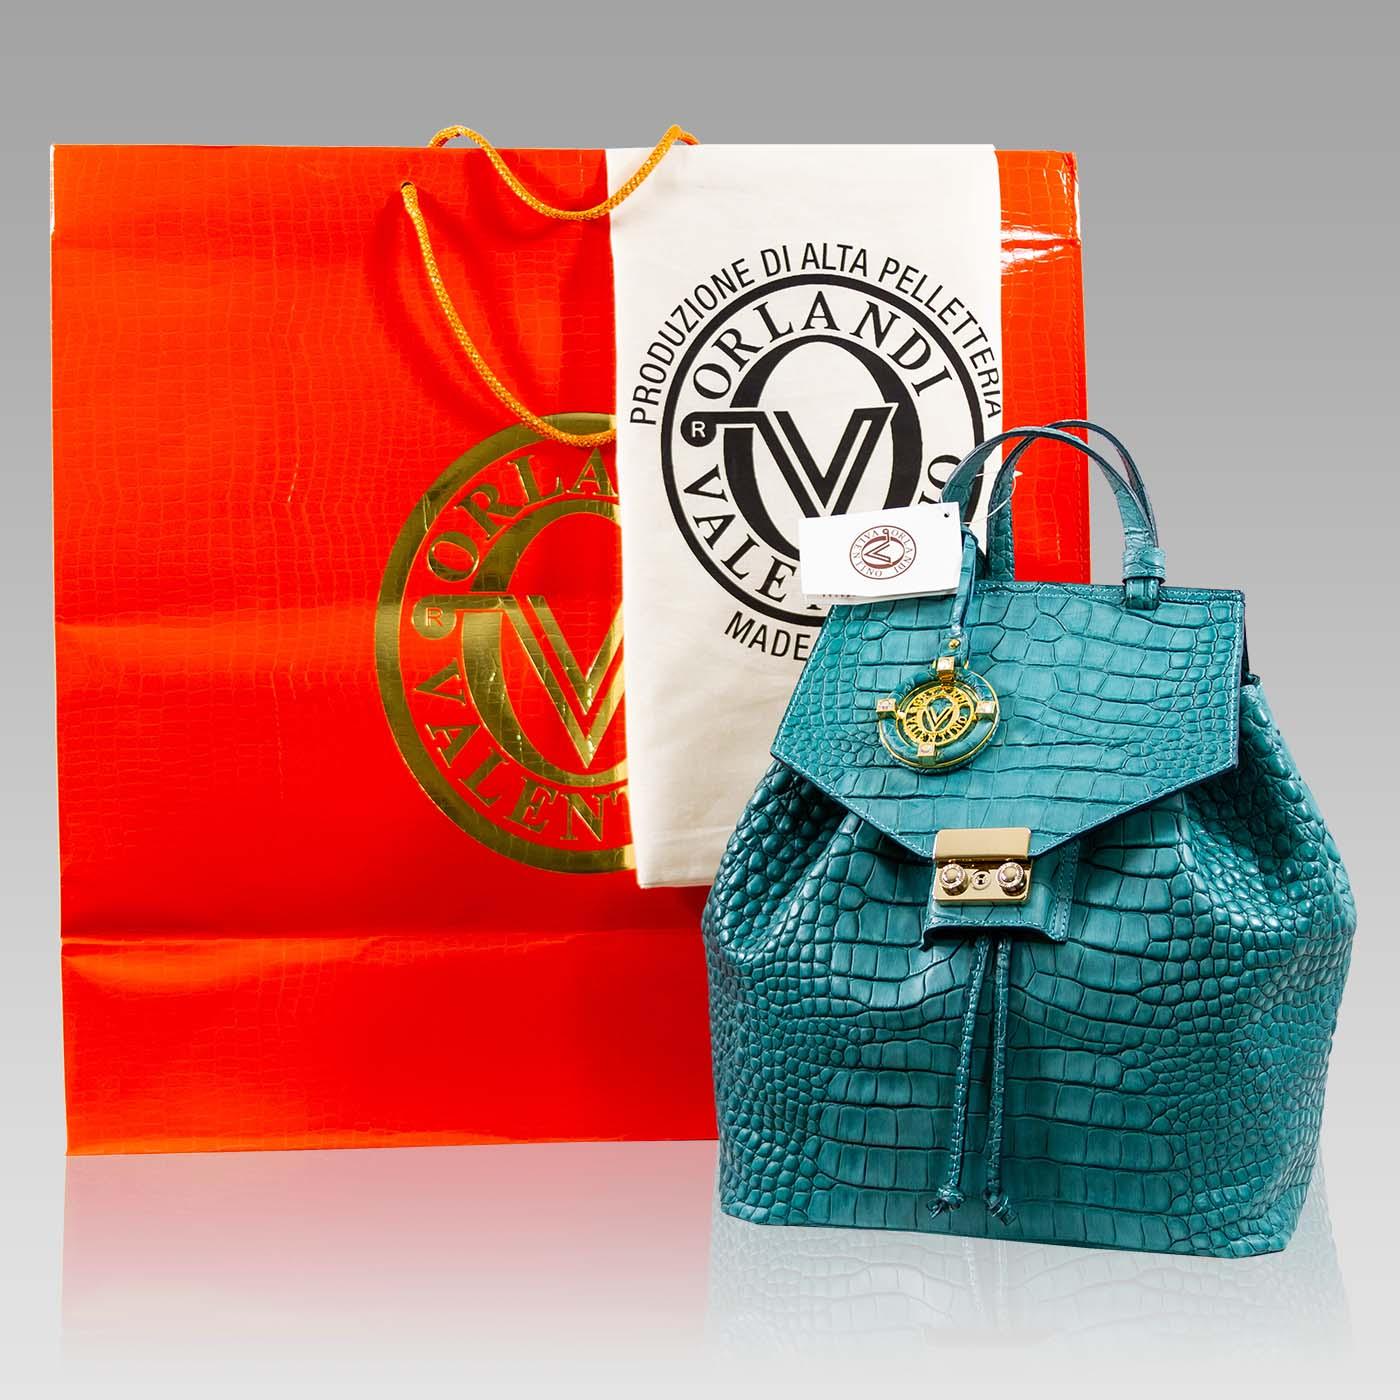 Valentino_Orlandi_Backpack_Deco_Blue_Croc_Embossed_Leather_Bucket_Bag_01VO41989CLAQ_05.jpg